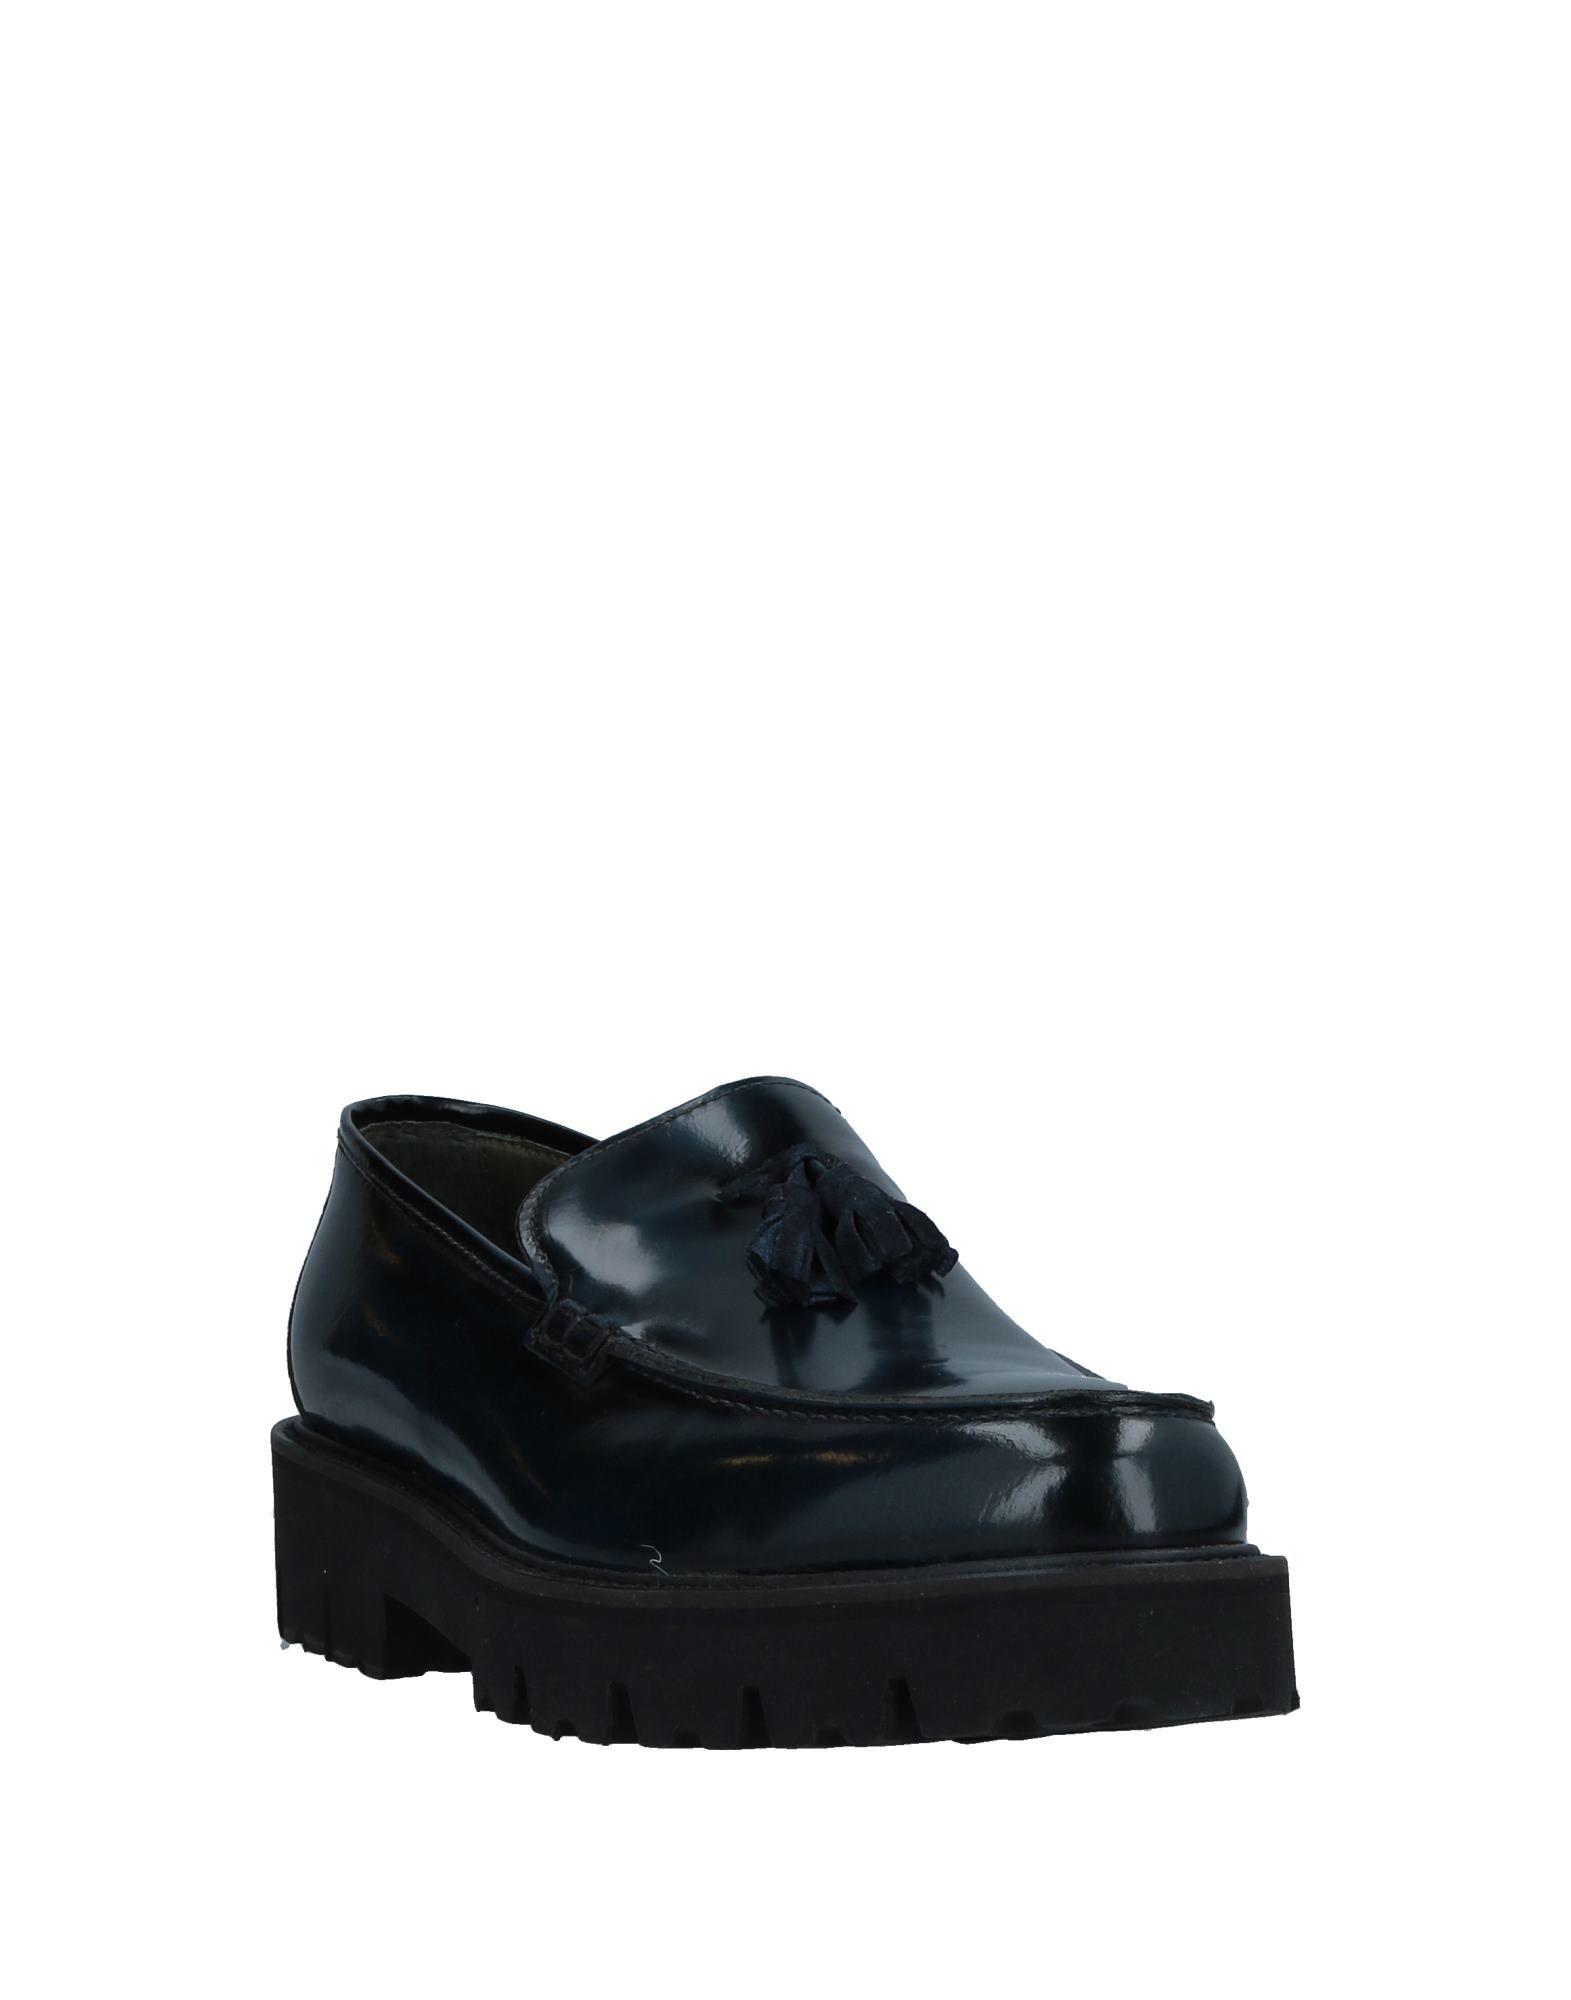 Rabatt Herren echte Schuhe Barbati Mokassins Herren Rabatt  11527902KT 499279